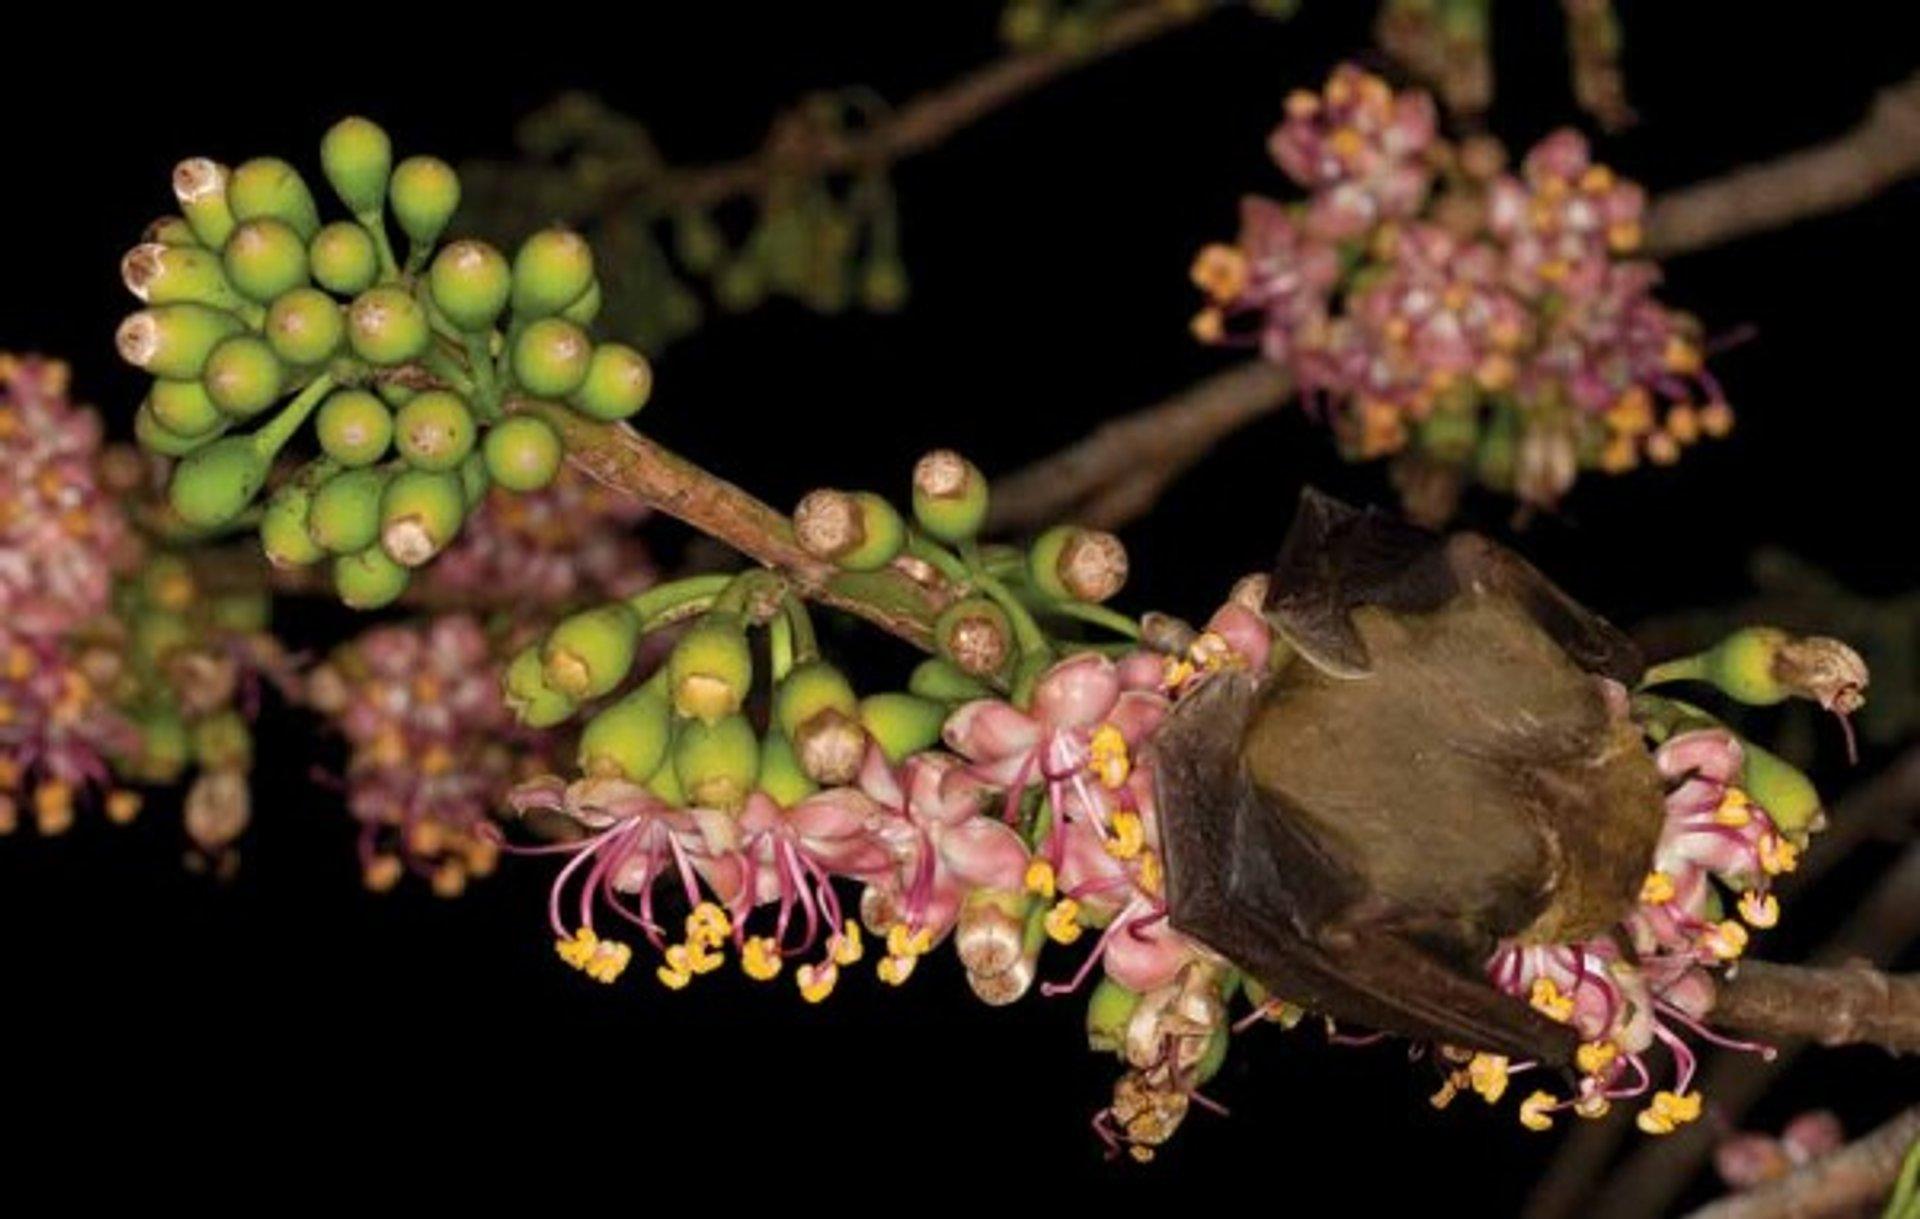 Ceiba Trees in Bloom in Guatemala 2019 - Best Time